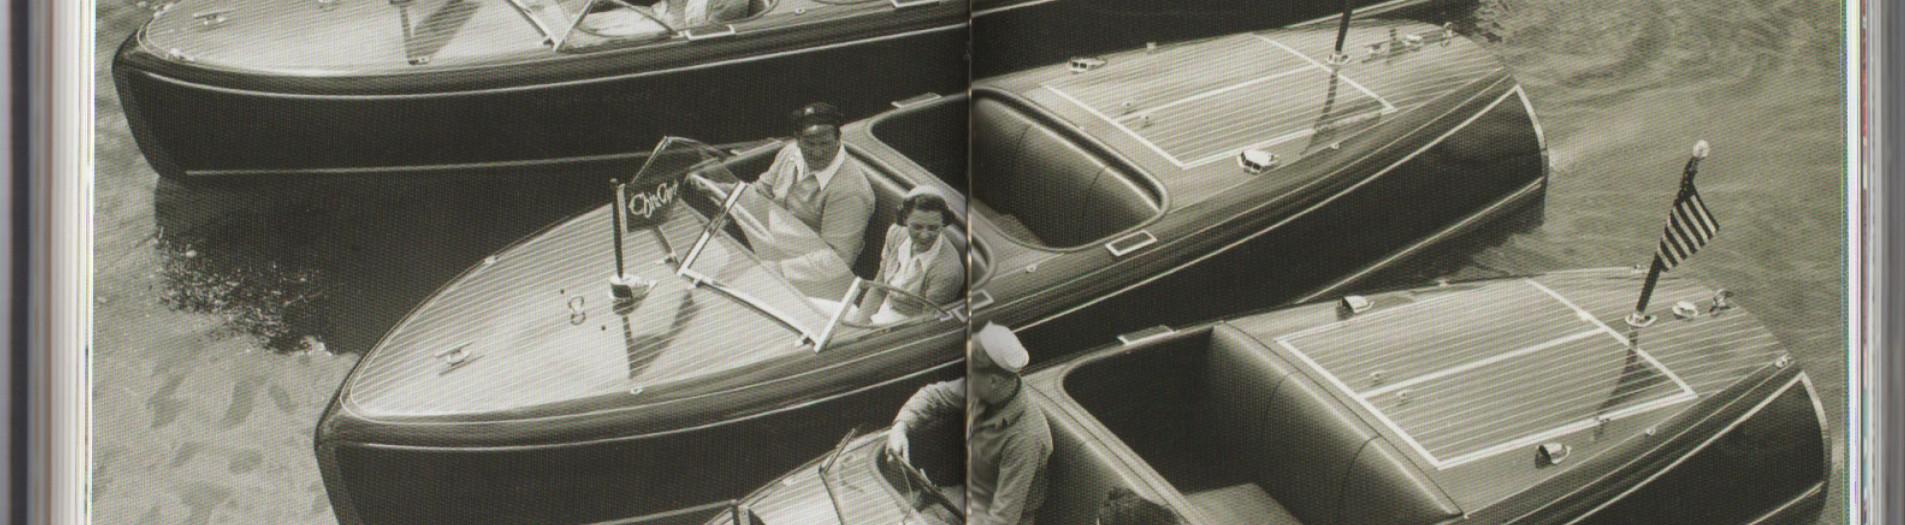 1. The Greyfalcon Boatbuilding Blog